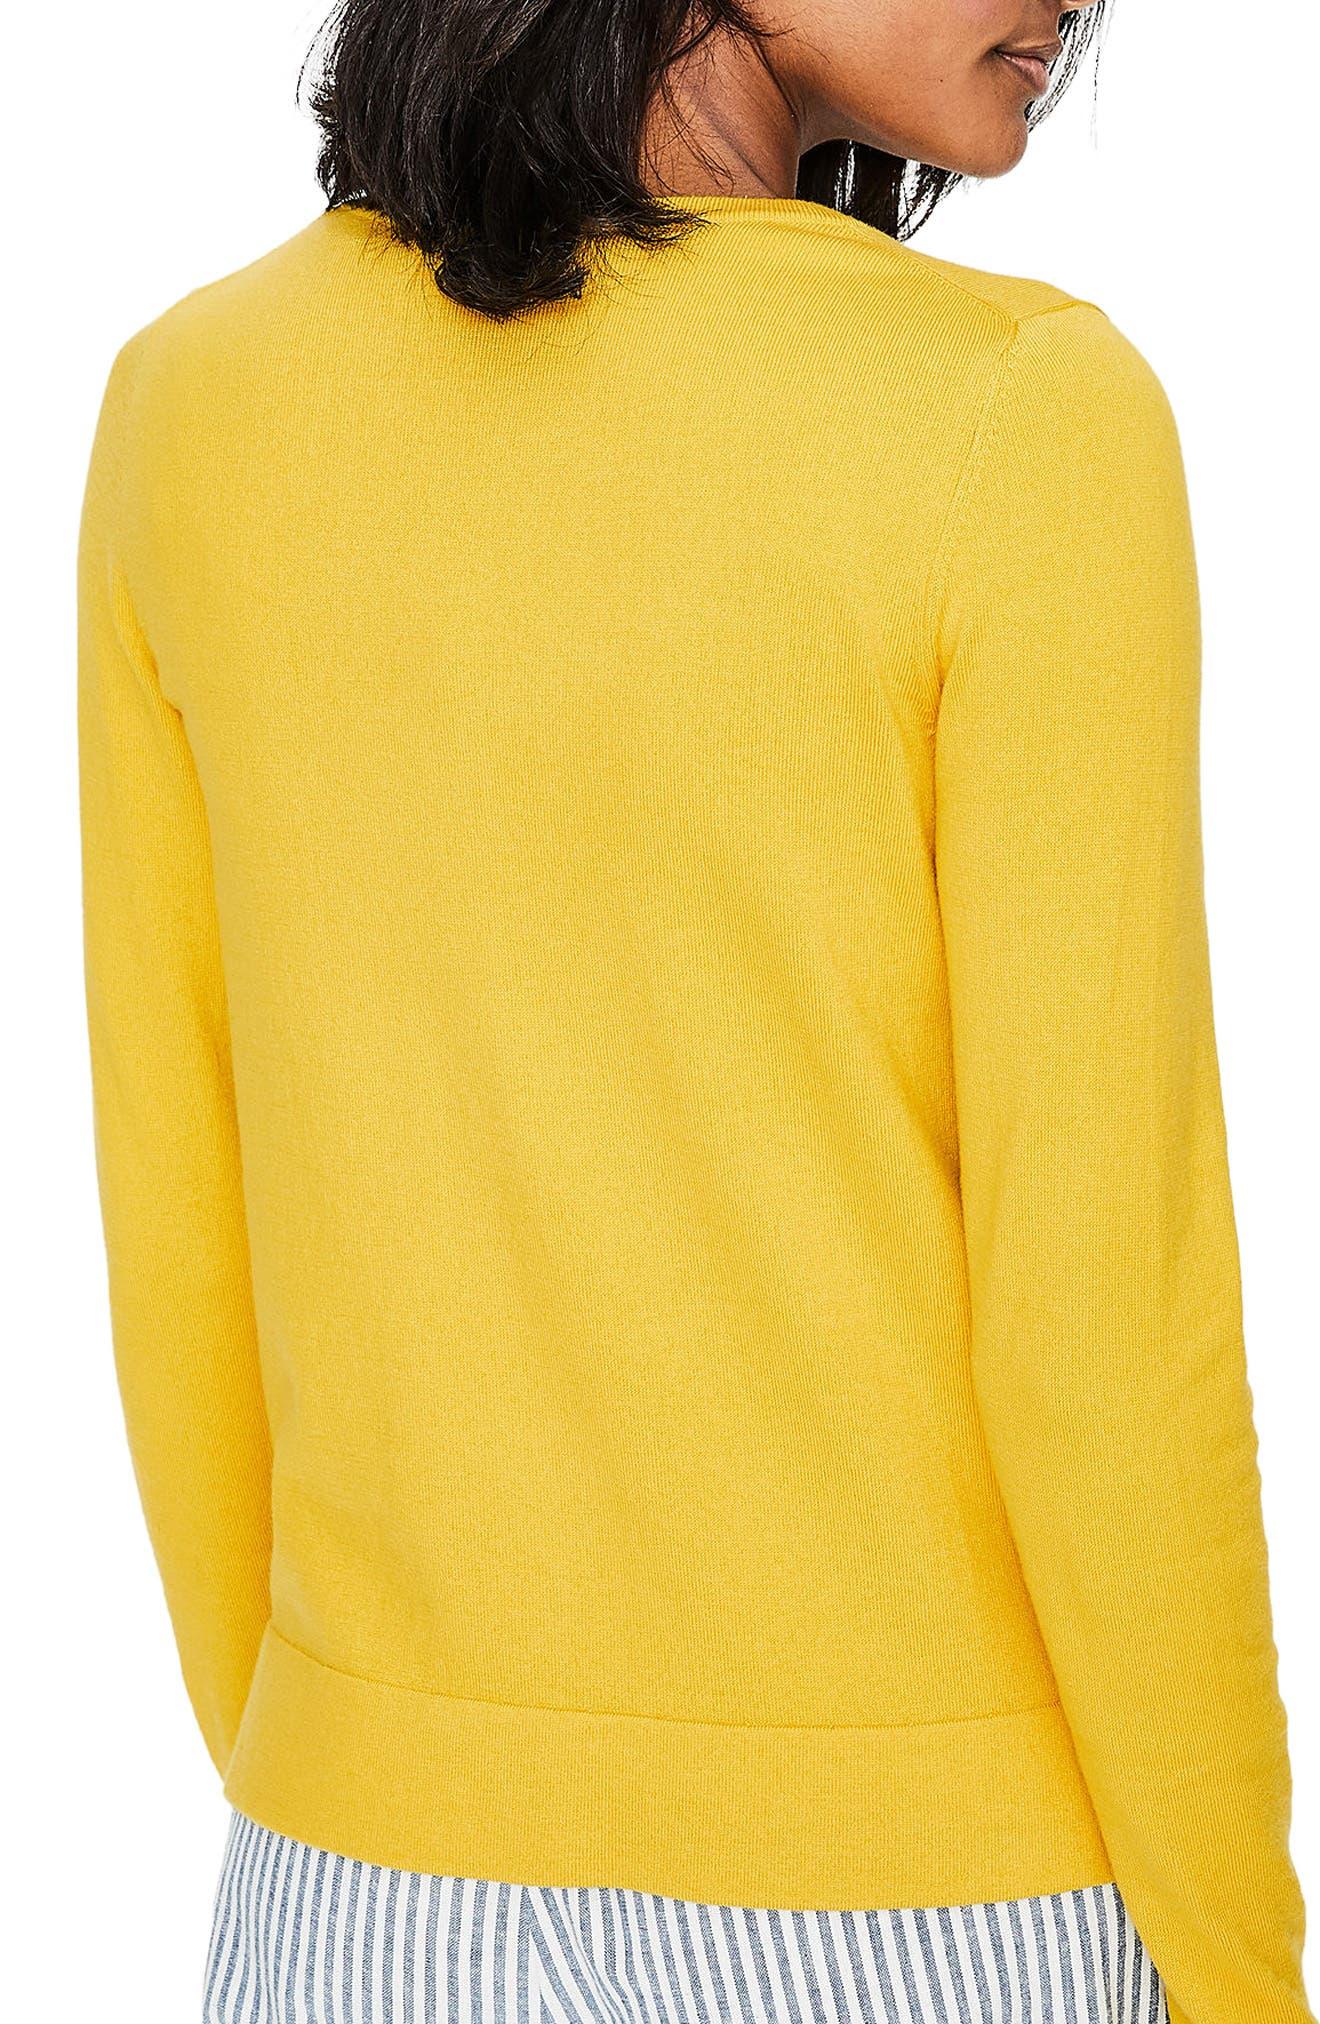 Crewneck Cardigan,                             Alternate thumbnail 3, color,                             Mimosa Yellow